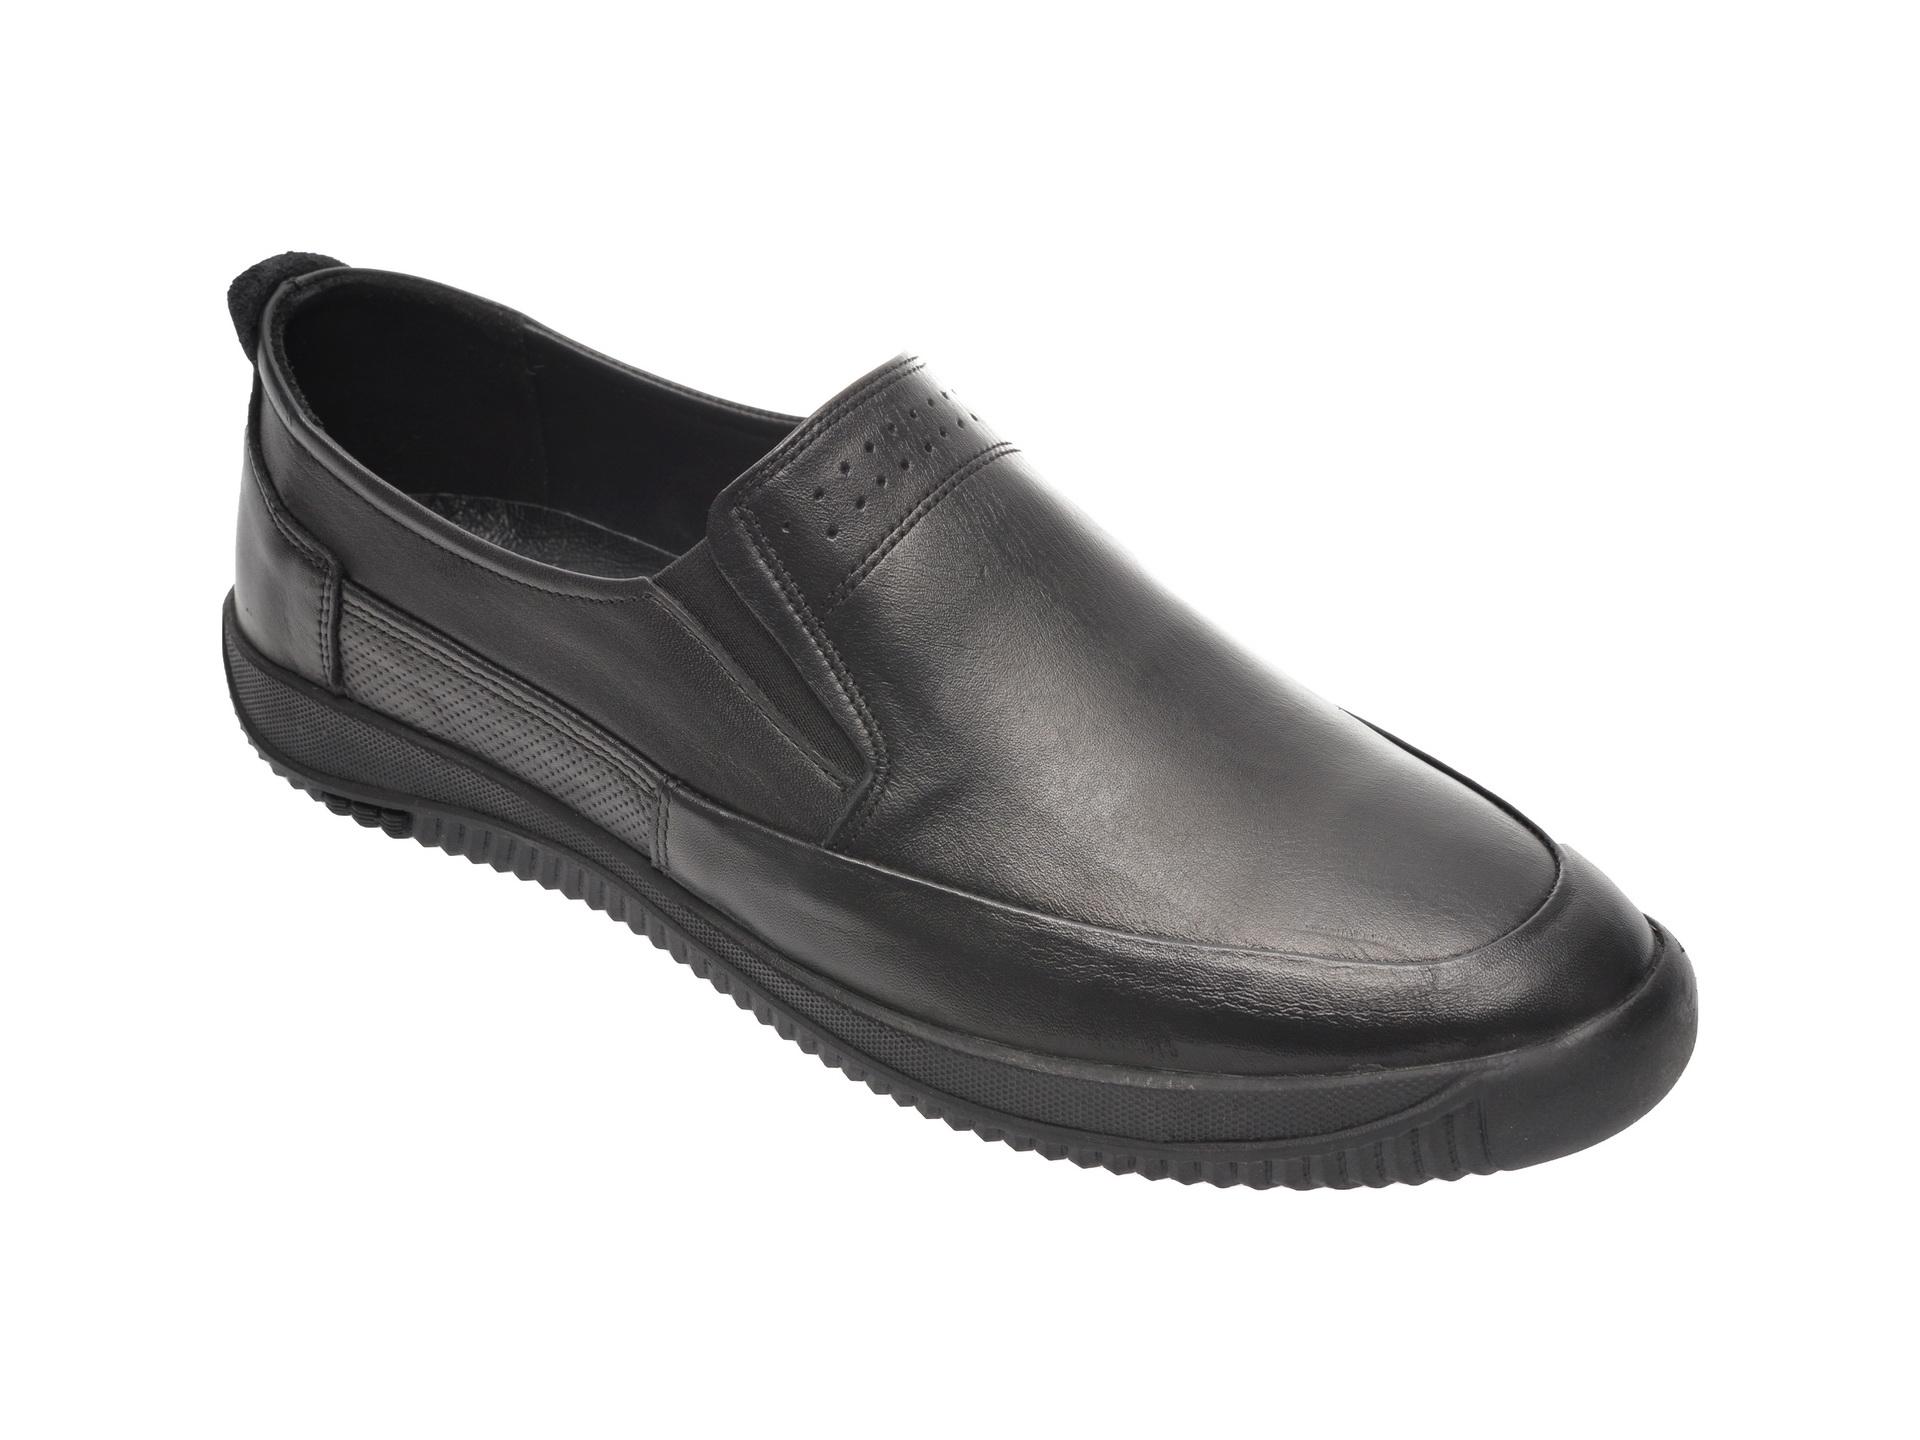 Pantofi OTTER negri, M5540, din piele naturala imagine